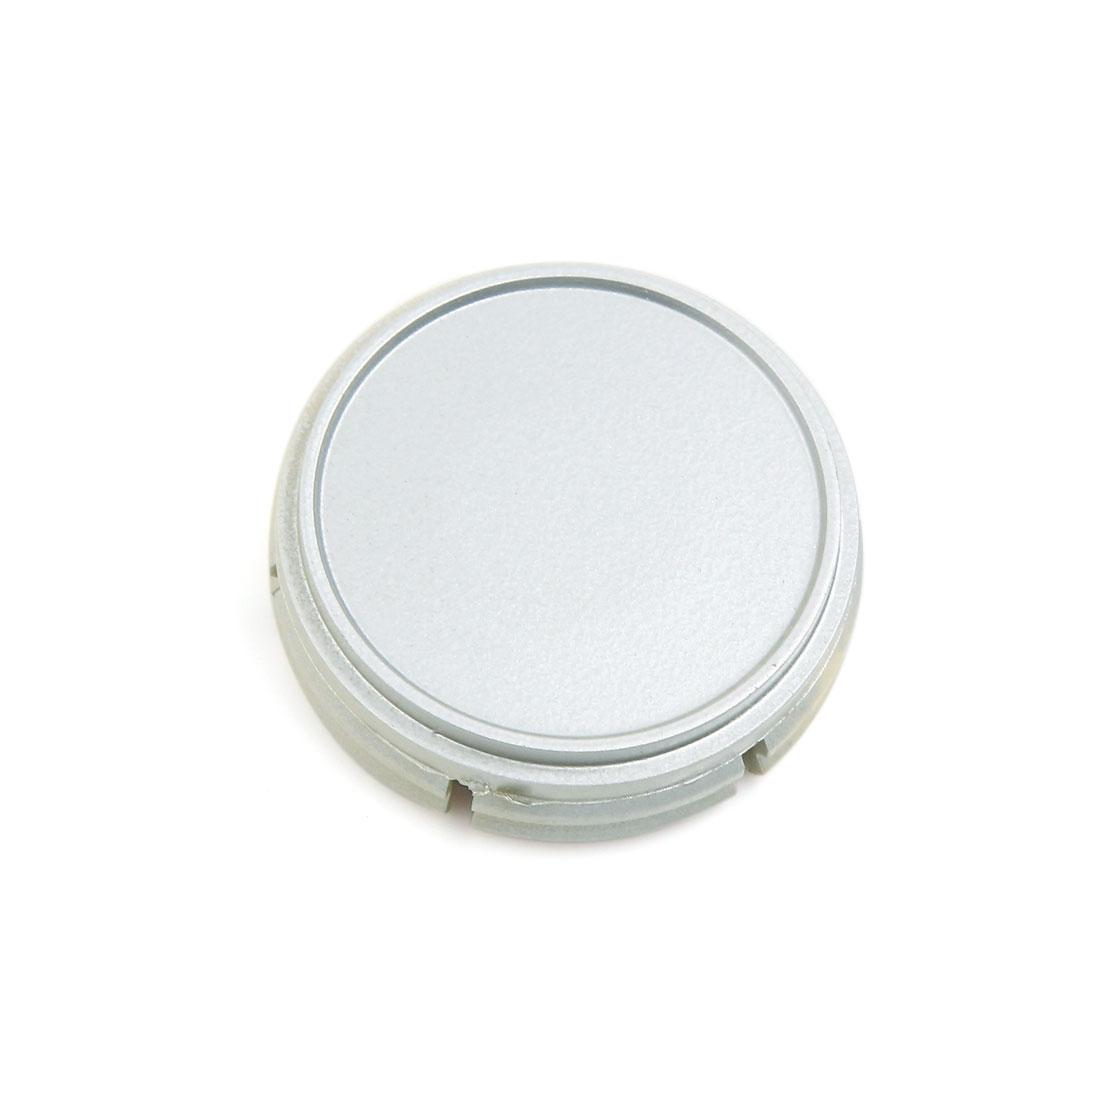 Car Auto 67mm Diameter Wheel Center Hub Cap Cover Guard Protector 6 Clips